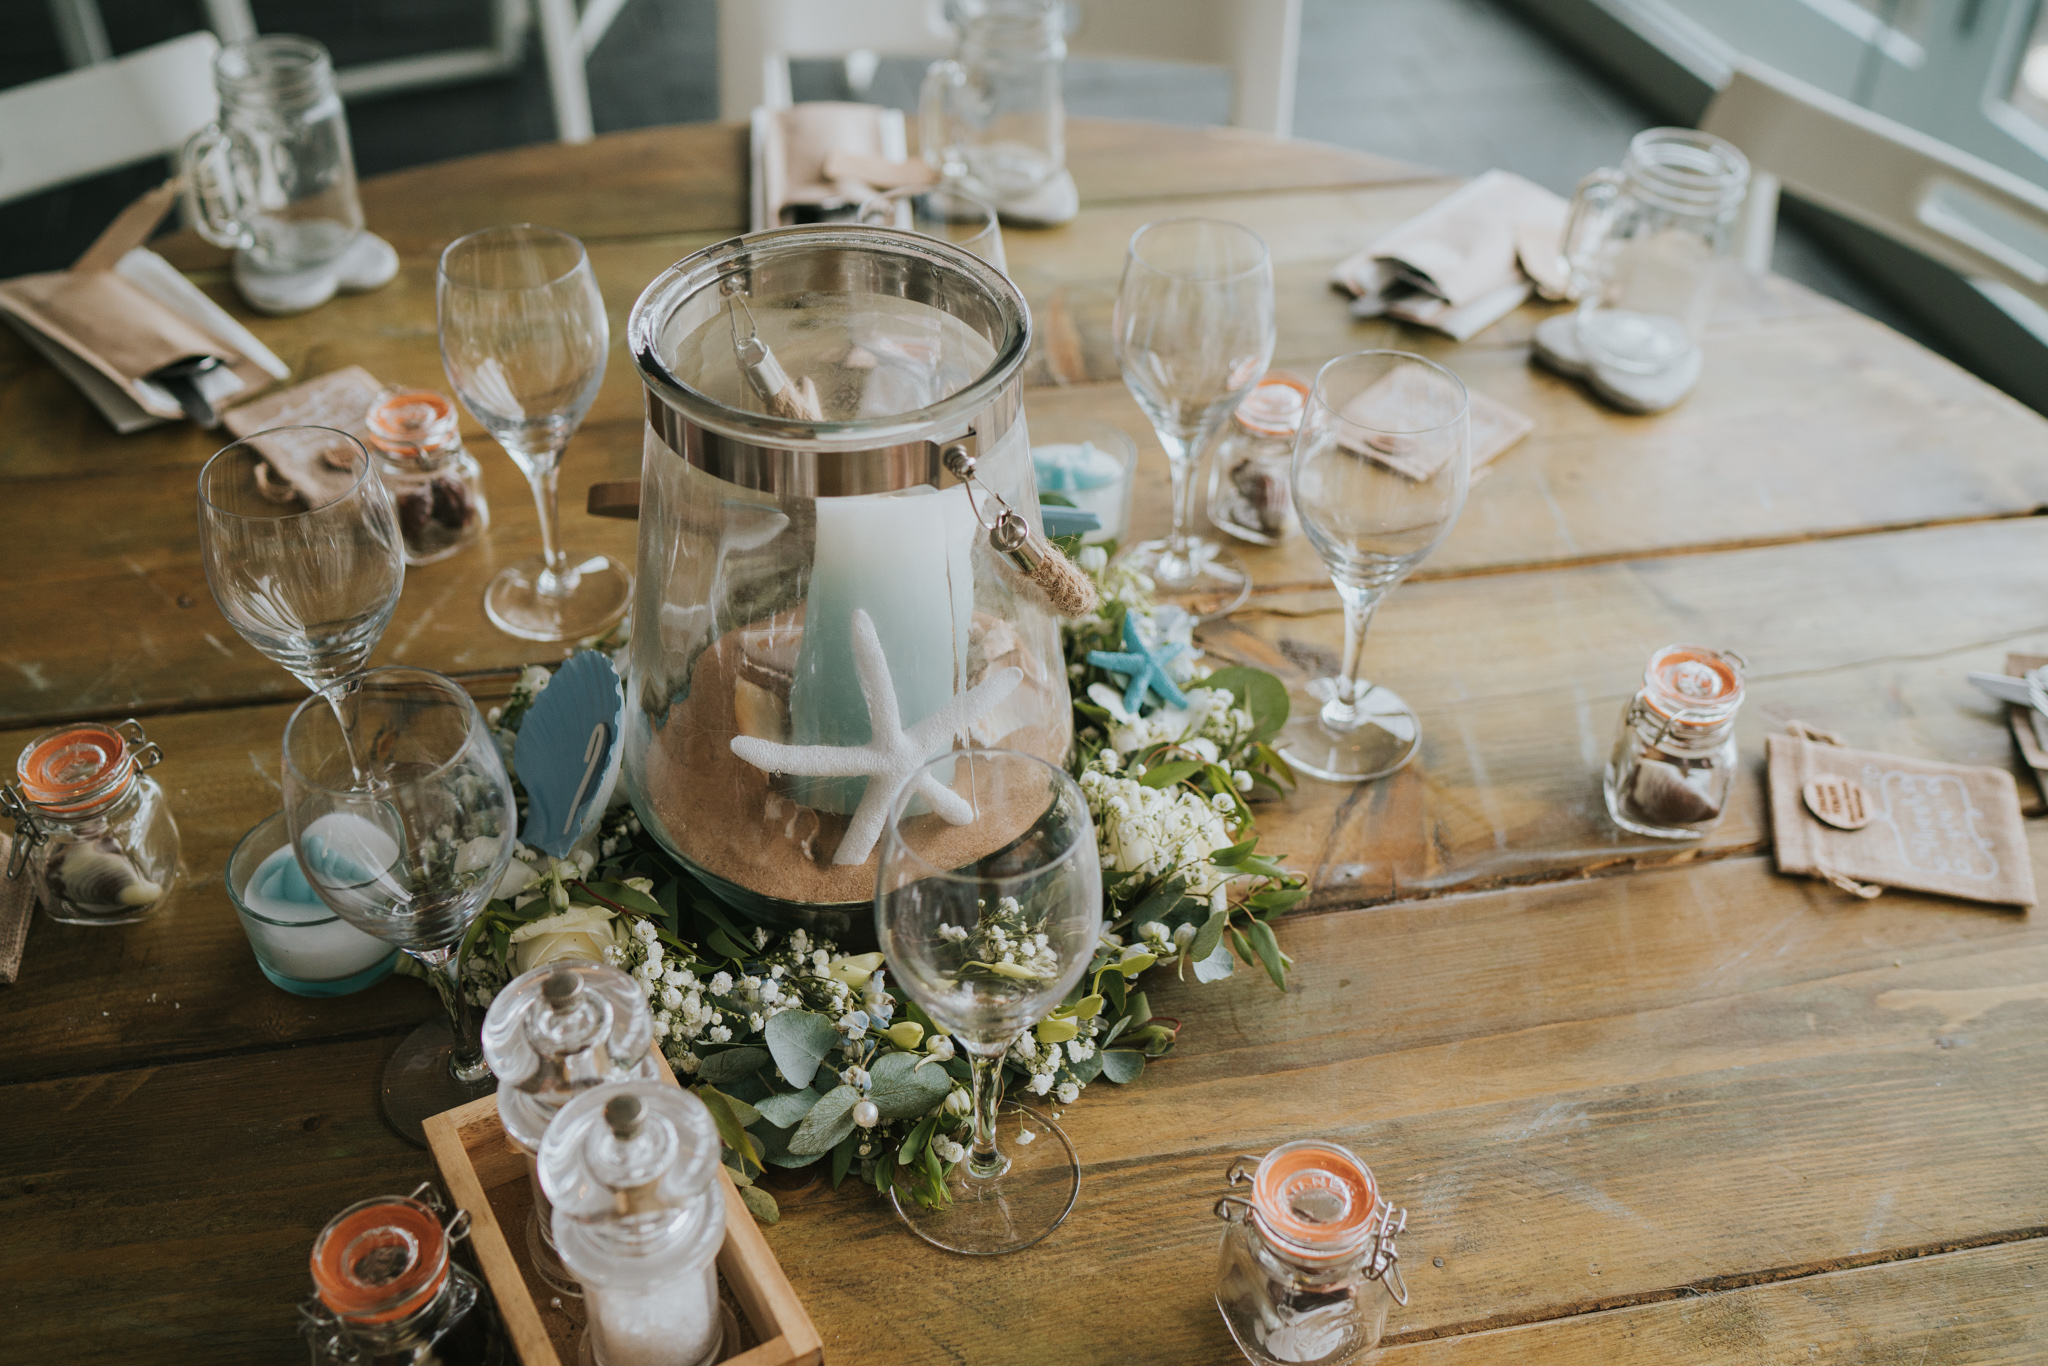 john-amy-relaxed-beach-wedding-tunnels-beaches-ilfracombe-north-devon-grace-elizabeth-colchester-essex-alternative-relaxed-wedding-photography-devon-suffolk-norfolk-essex (87 of 159).jpg